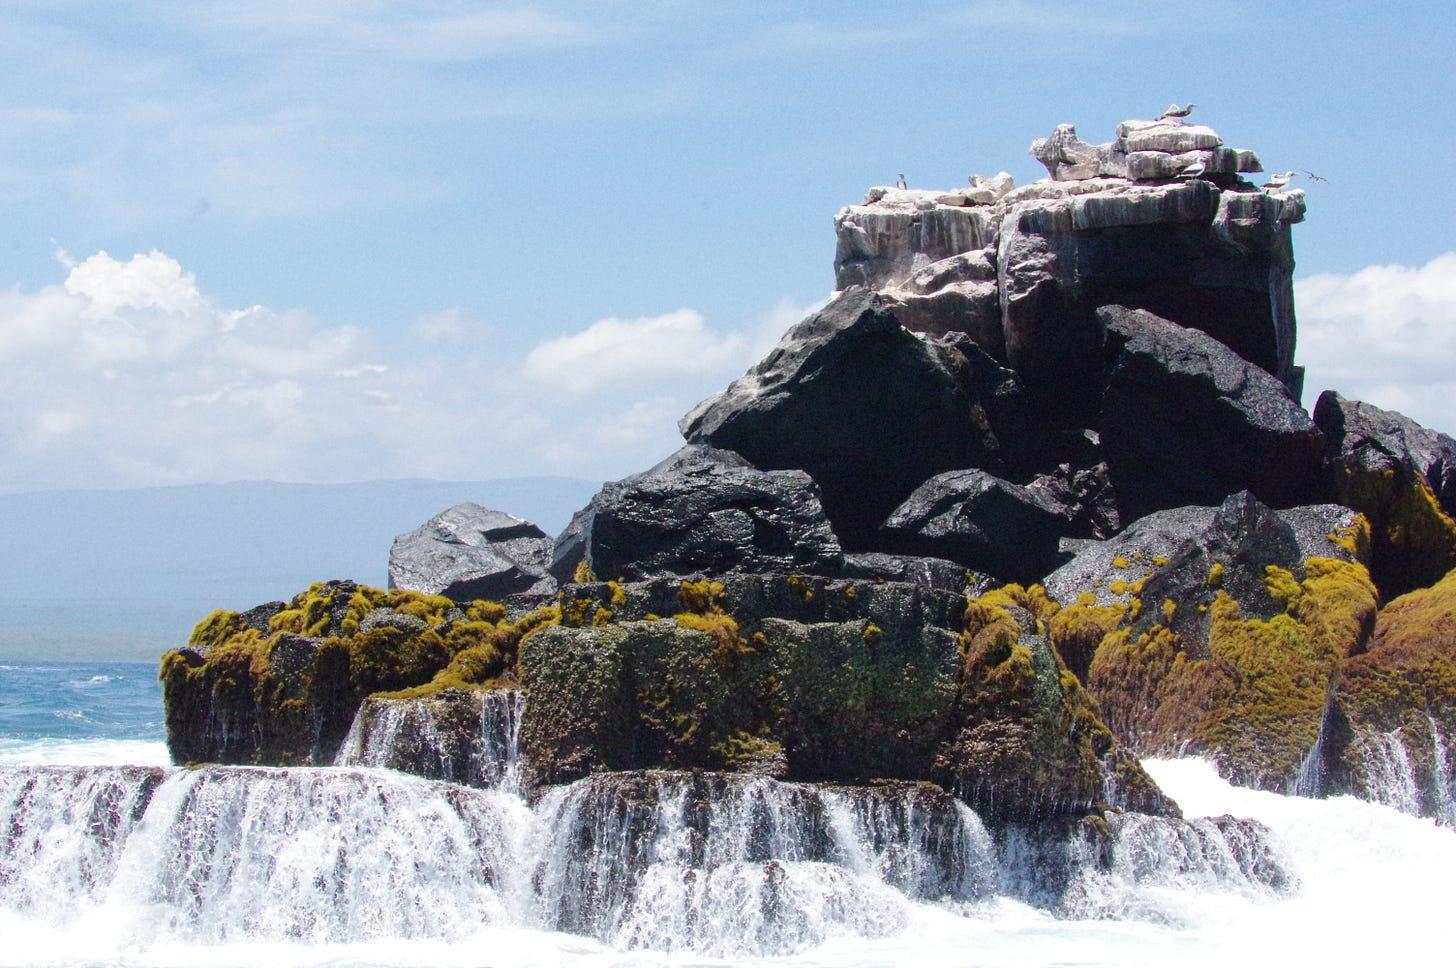 An exquisite rock en route to Los Tuneles. Photo by Bret, 3-29-16